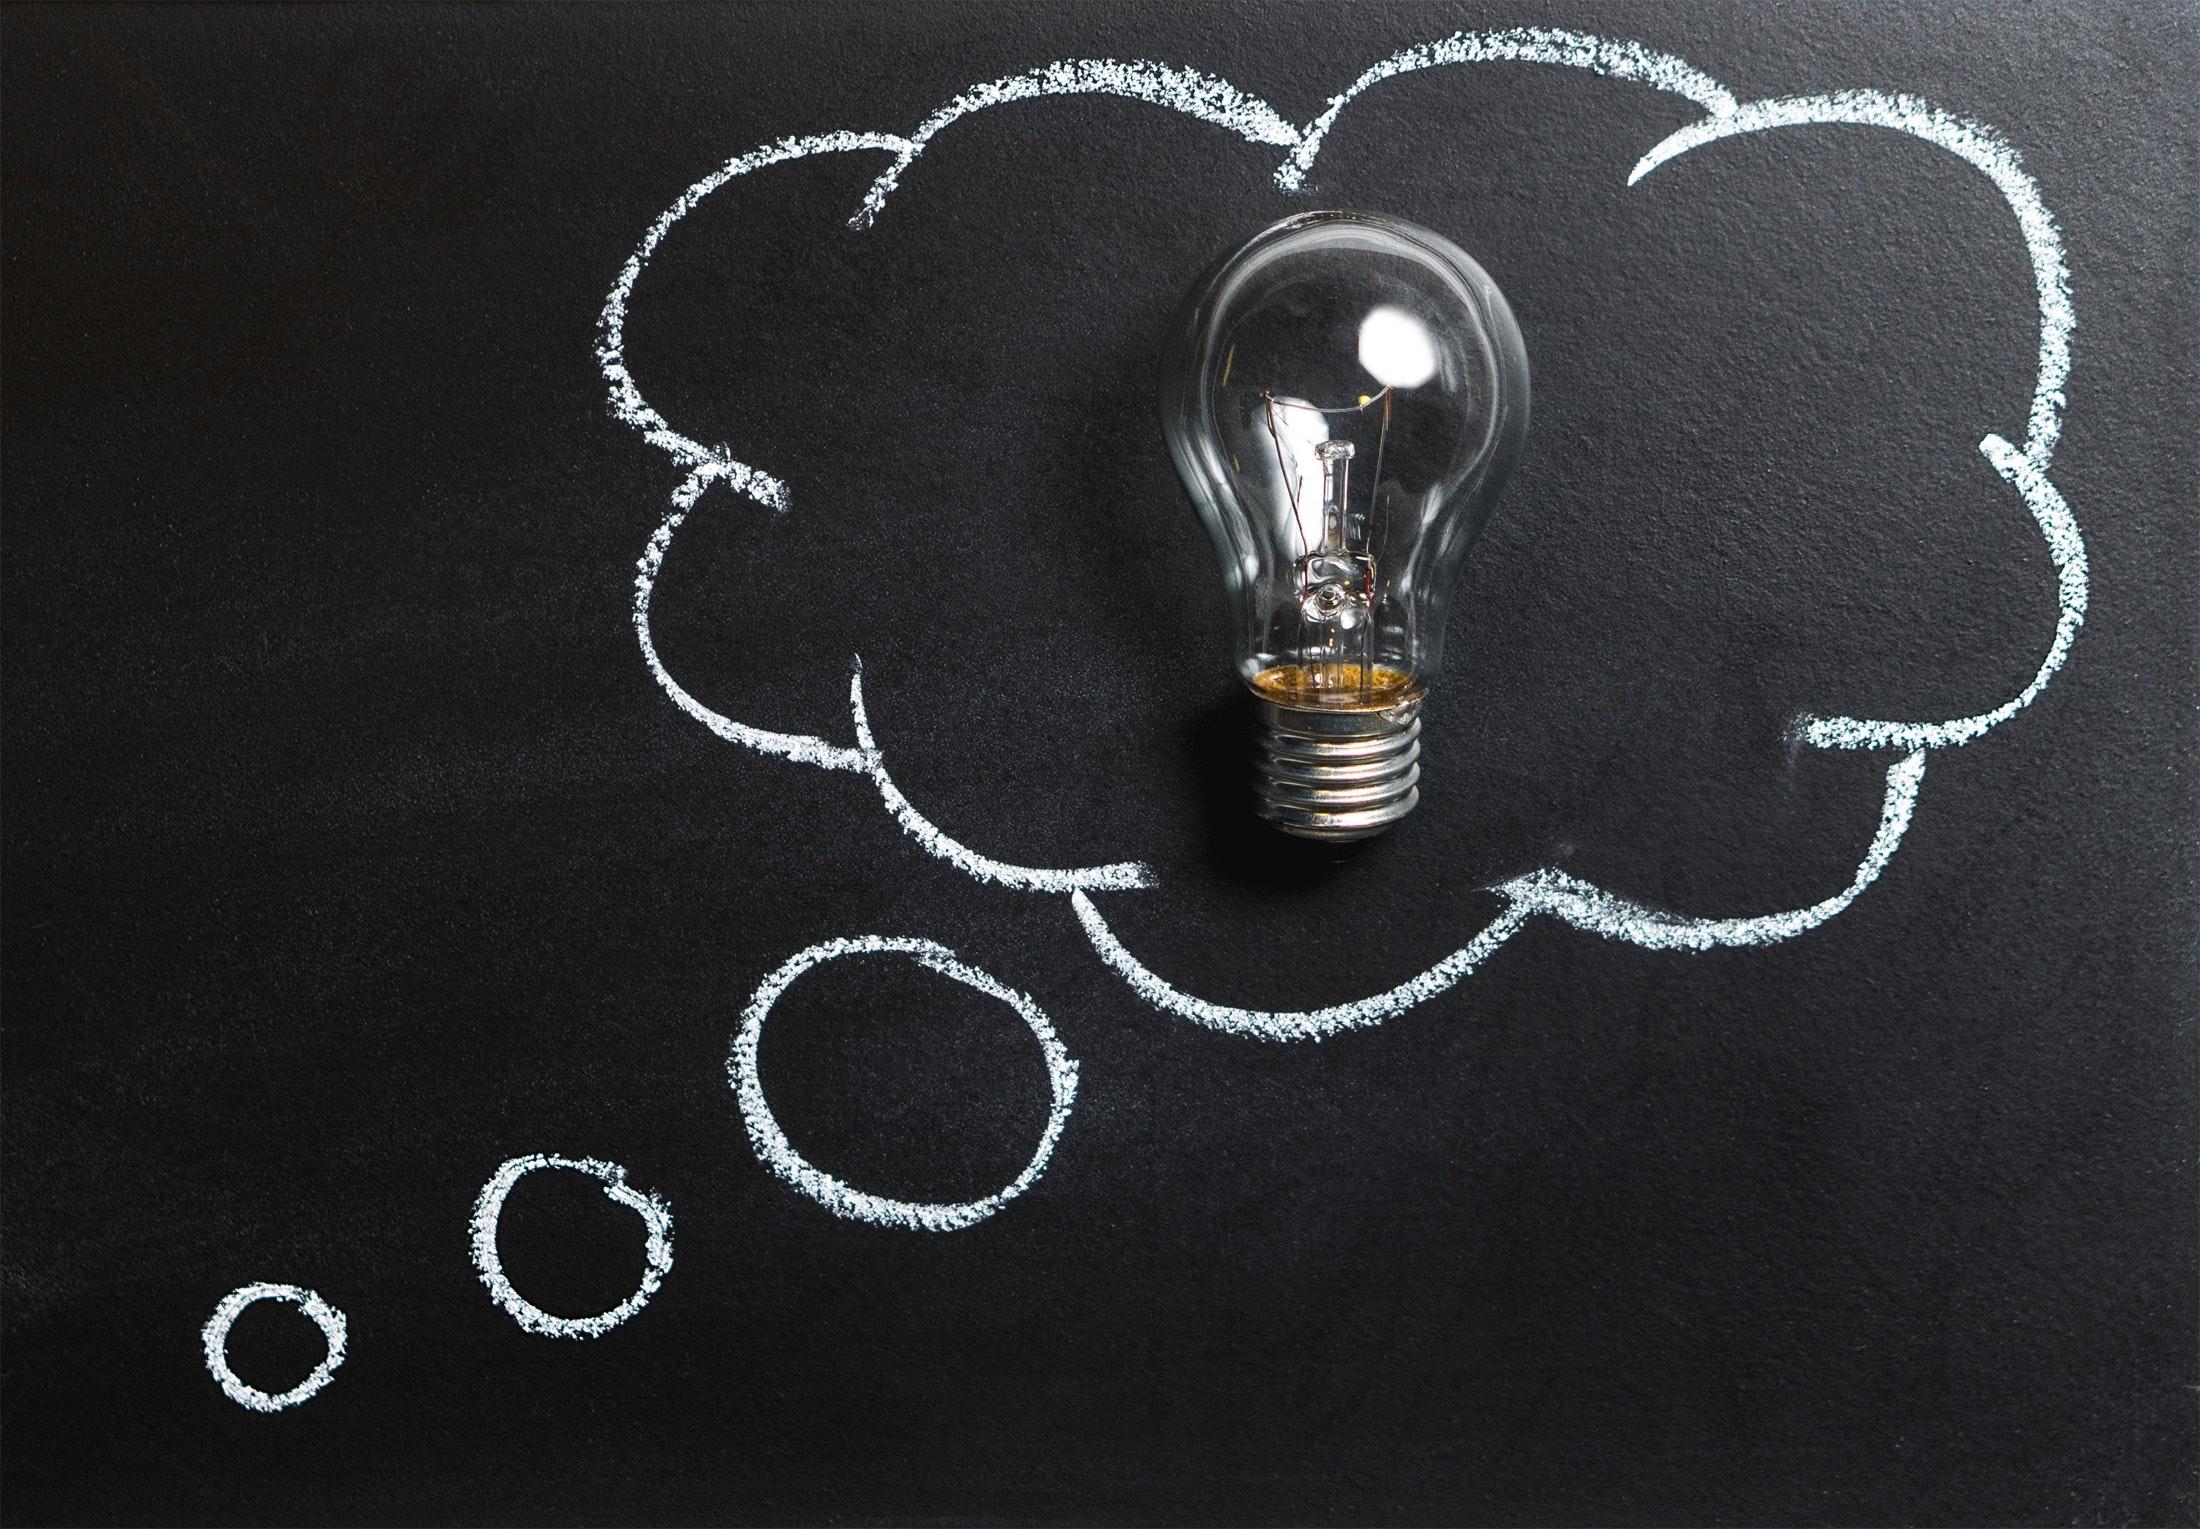 blackboard with light bulb